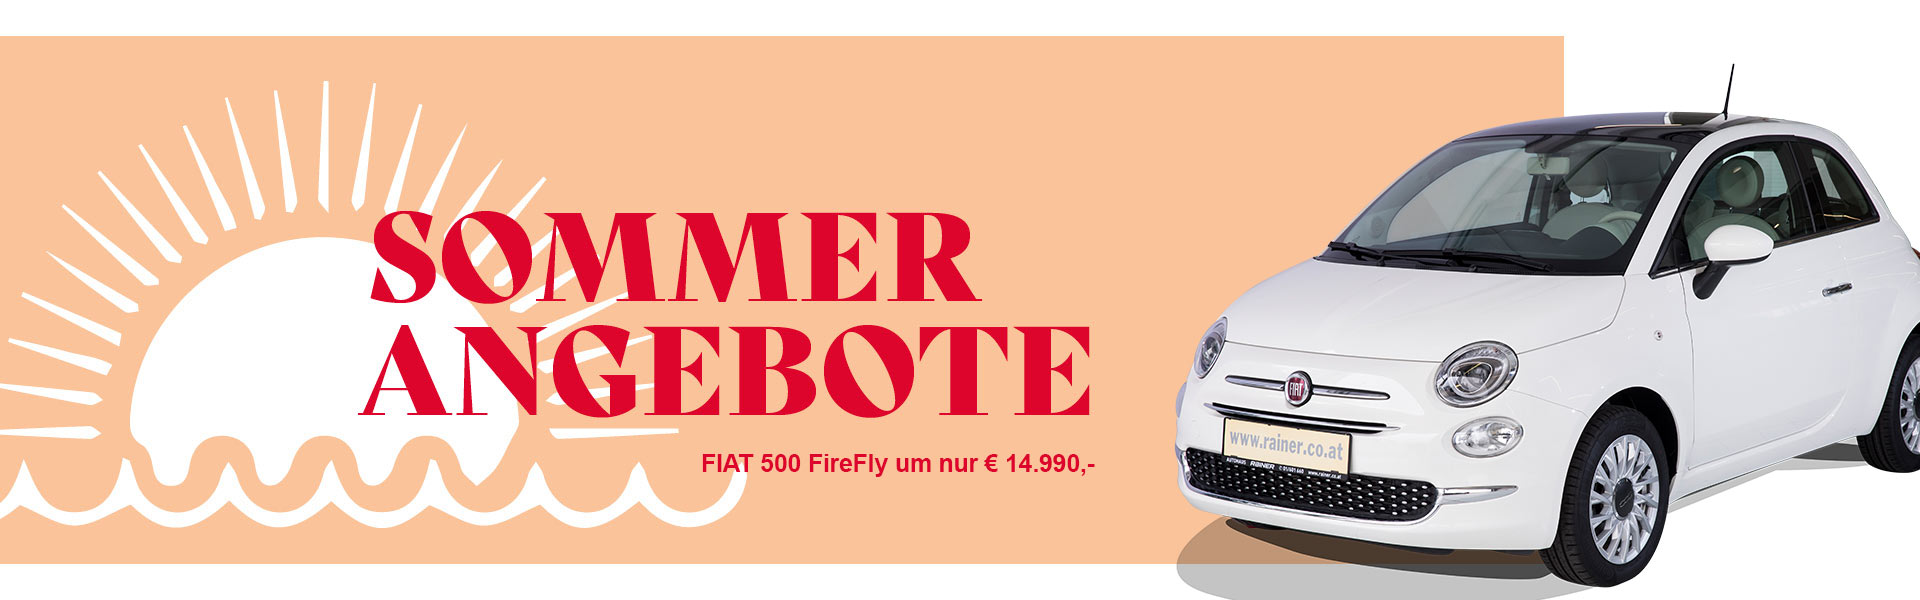 Sommer Angebote Fiat